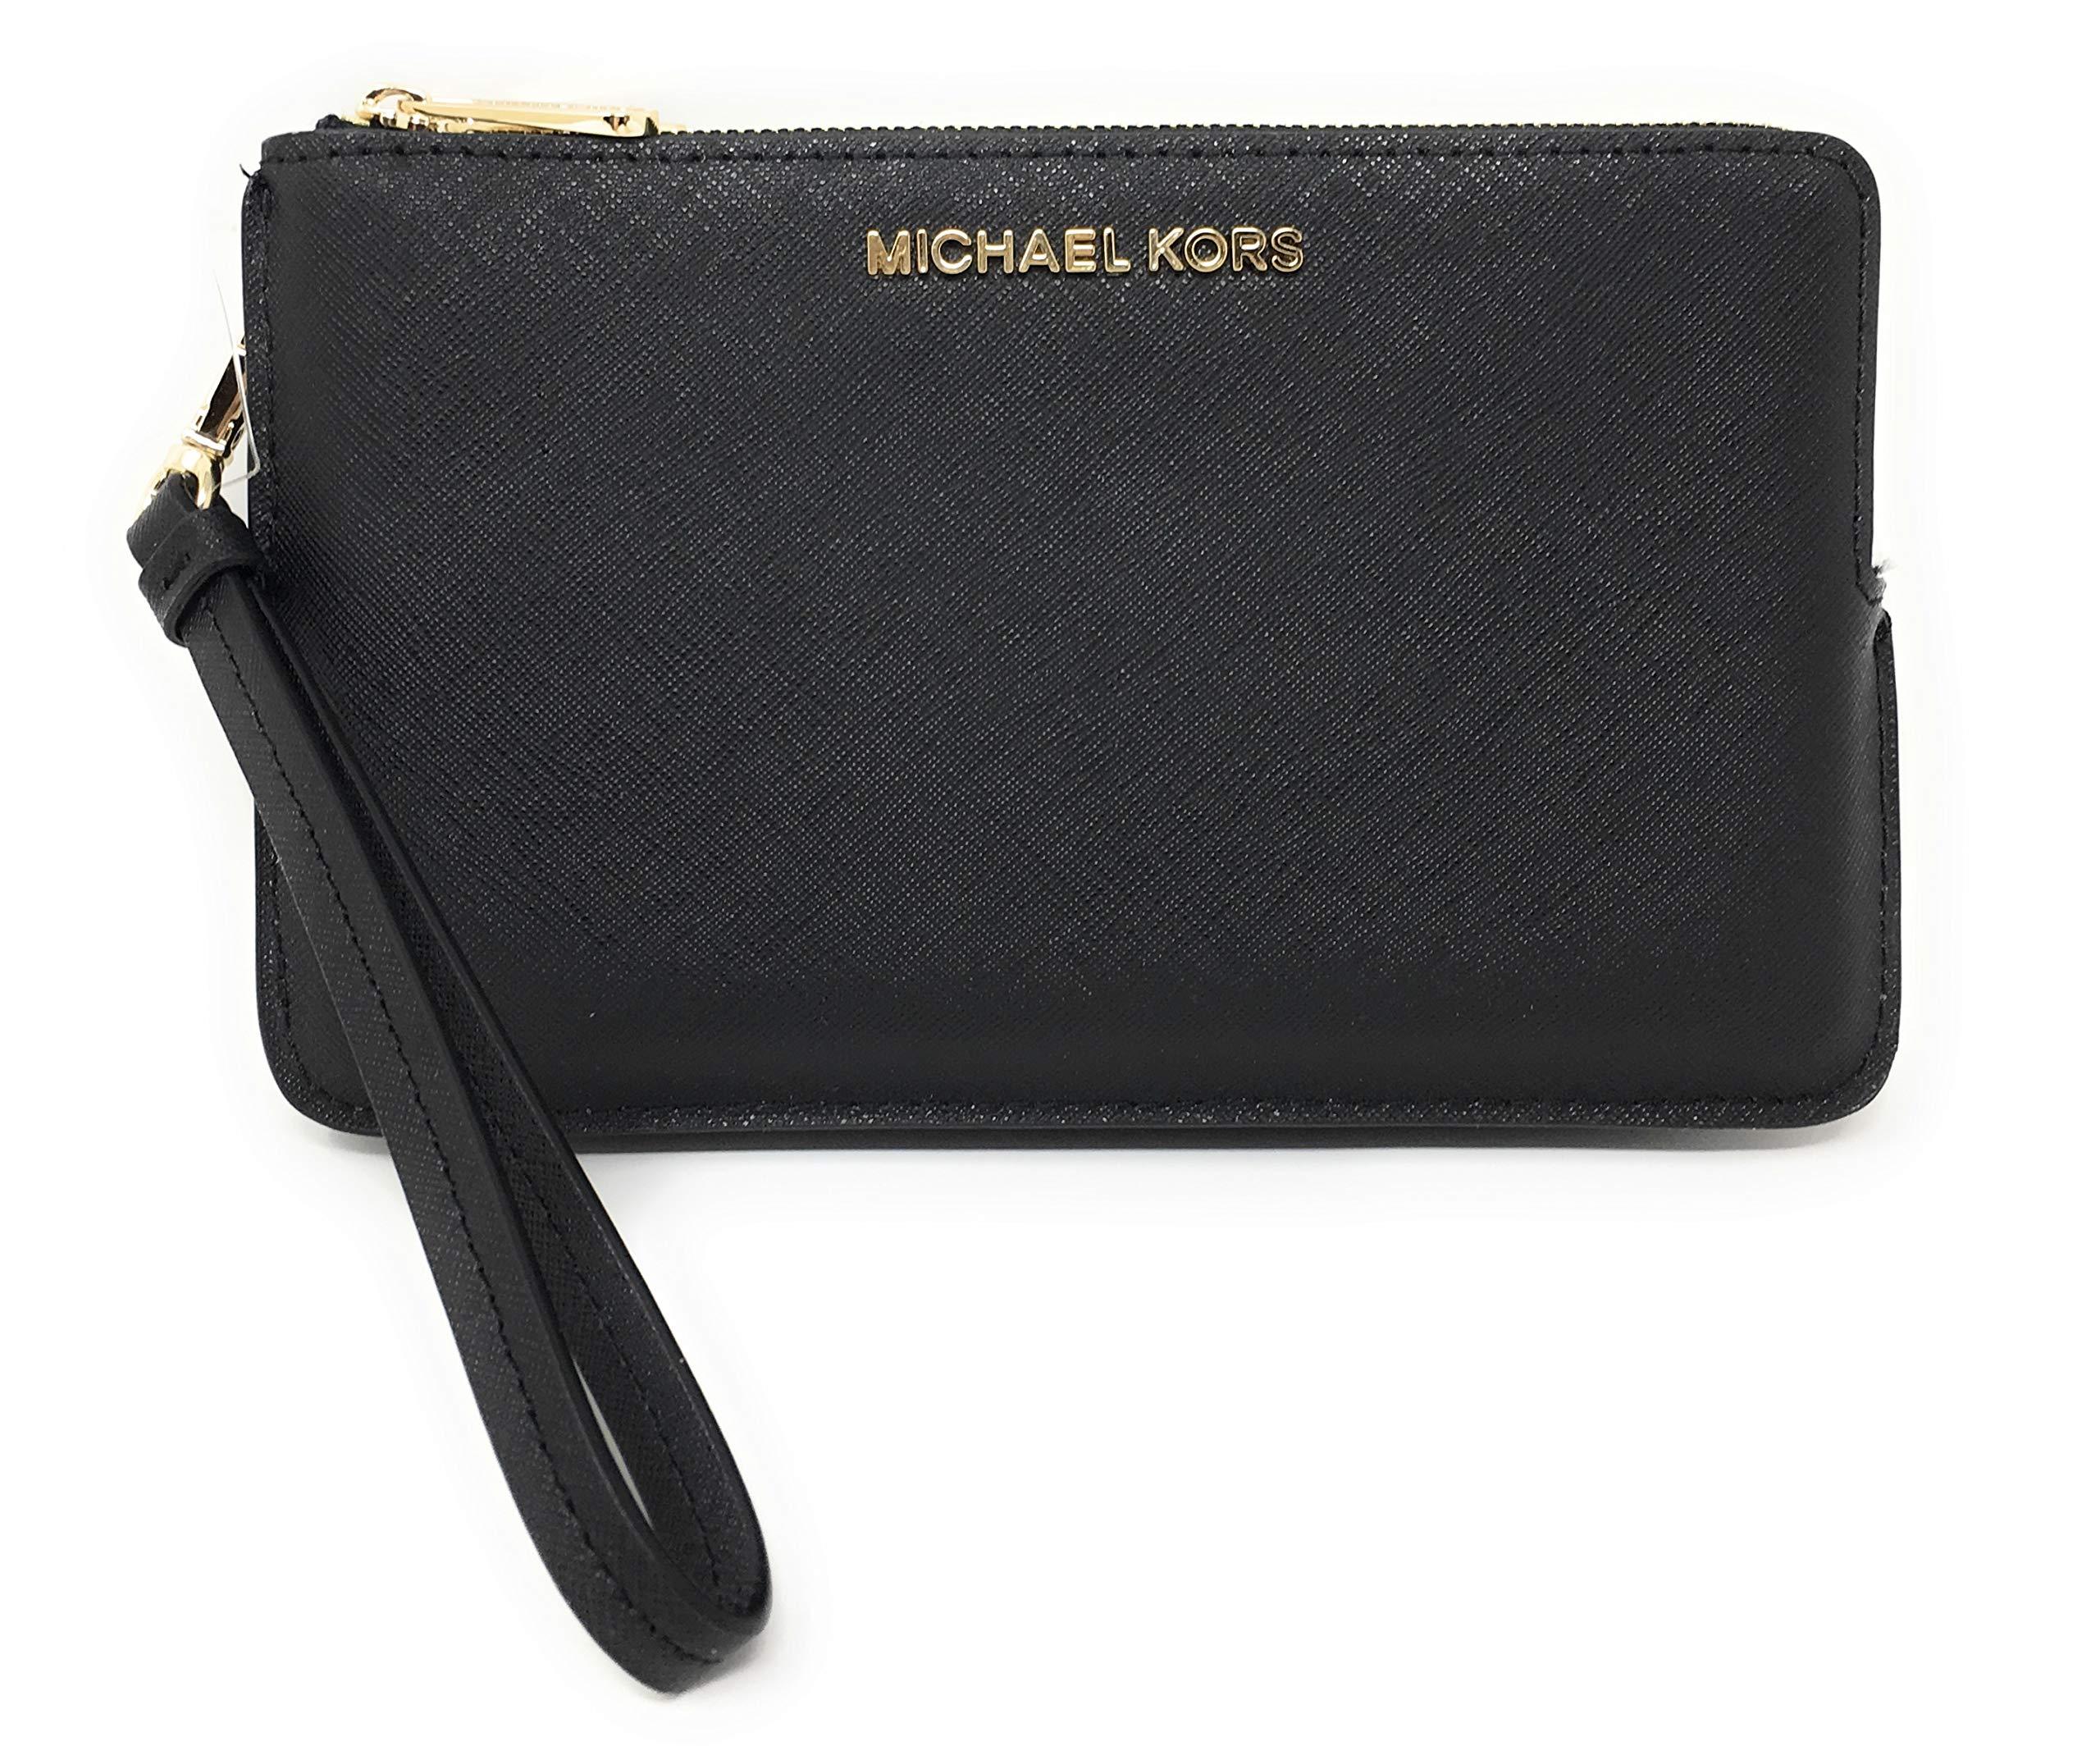 Michael Kors Jet Set Travel Extra Large Double Gusset Top Zip Saffiano Leather Wristlet (Black)